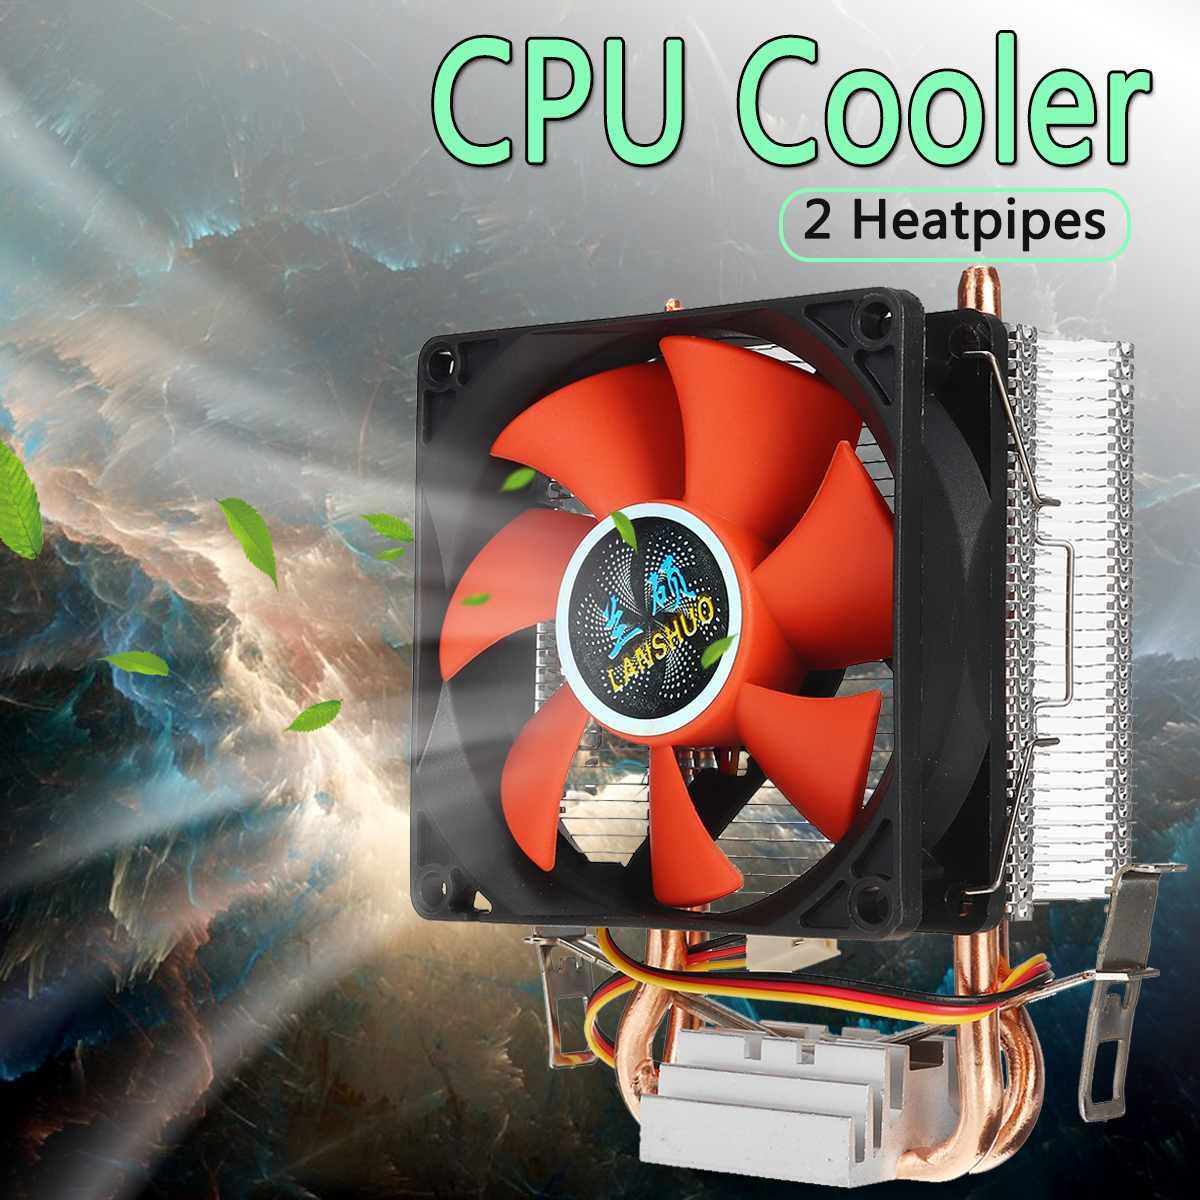 8cm Mini CPU Cooler 2 Heatpipes PC CPU Cooler Heatsink Computer Cooling Fan For LGA 775/1155/1156 AMD AM2 AMD3 Free Shipping